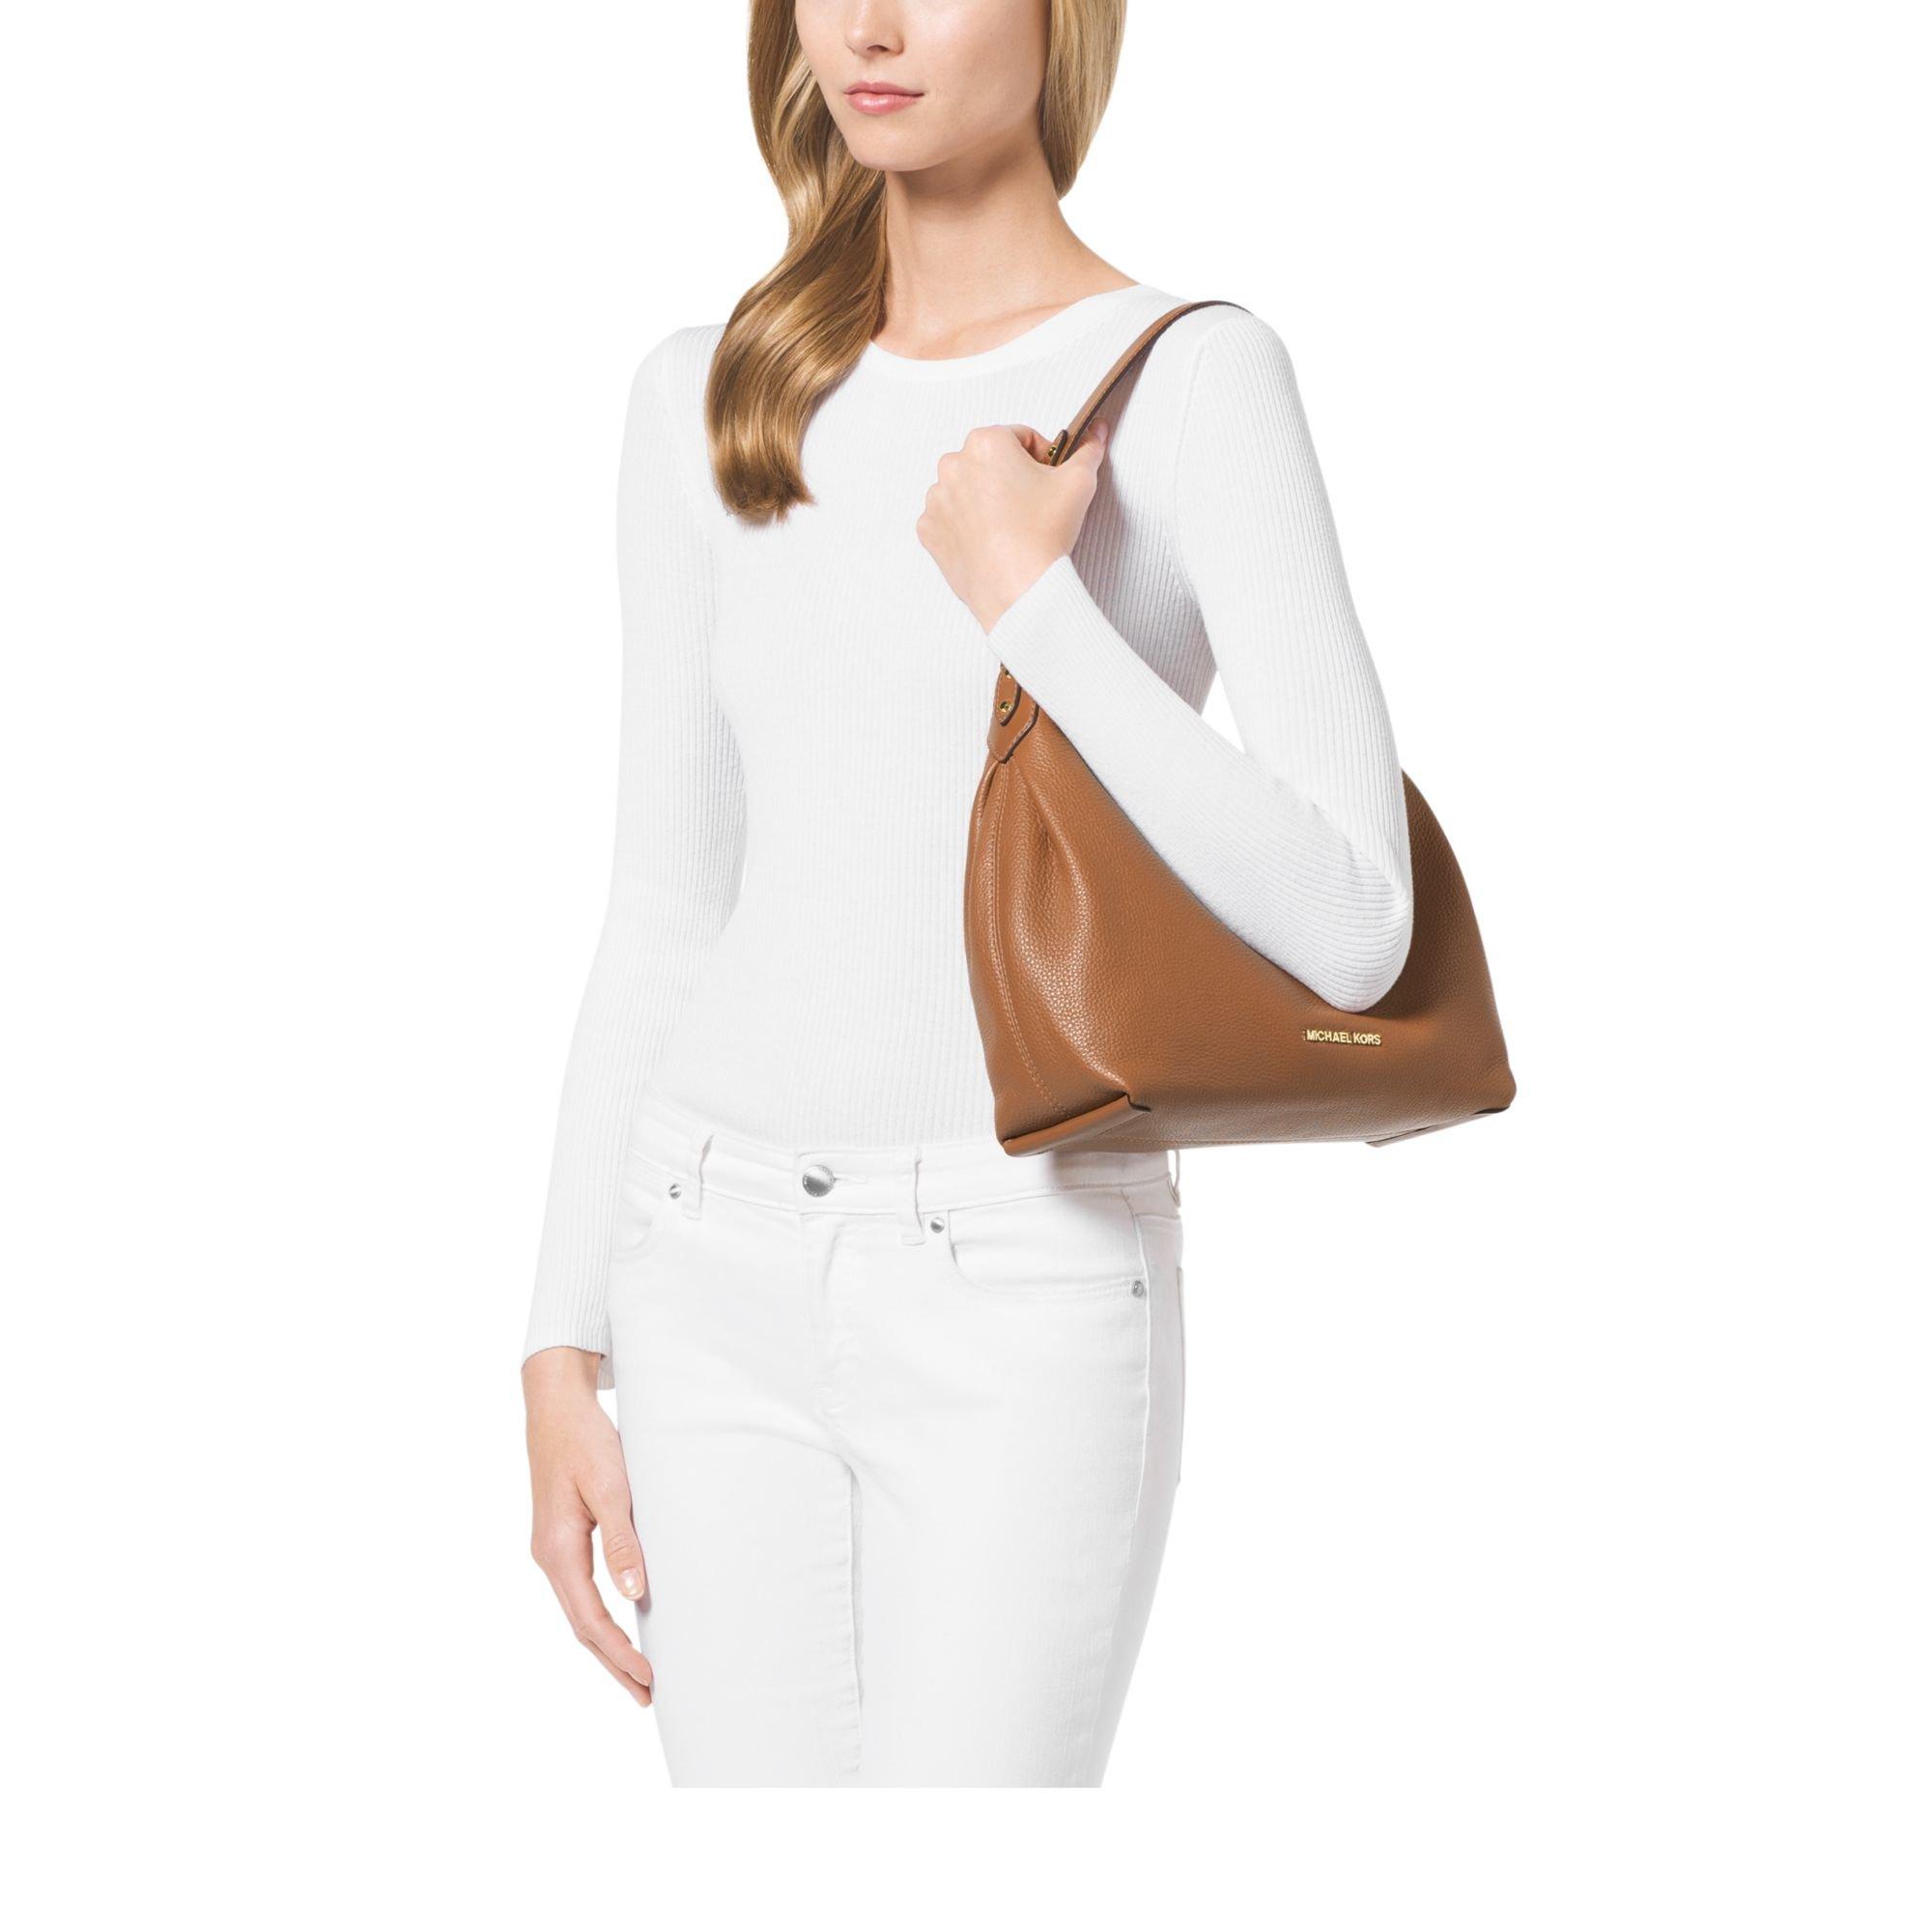 368ec6892764f Michael Kors Isabella Medium Leather Shoulder Bag in Brown - Lyst